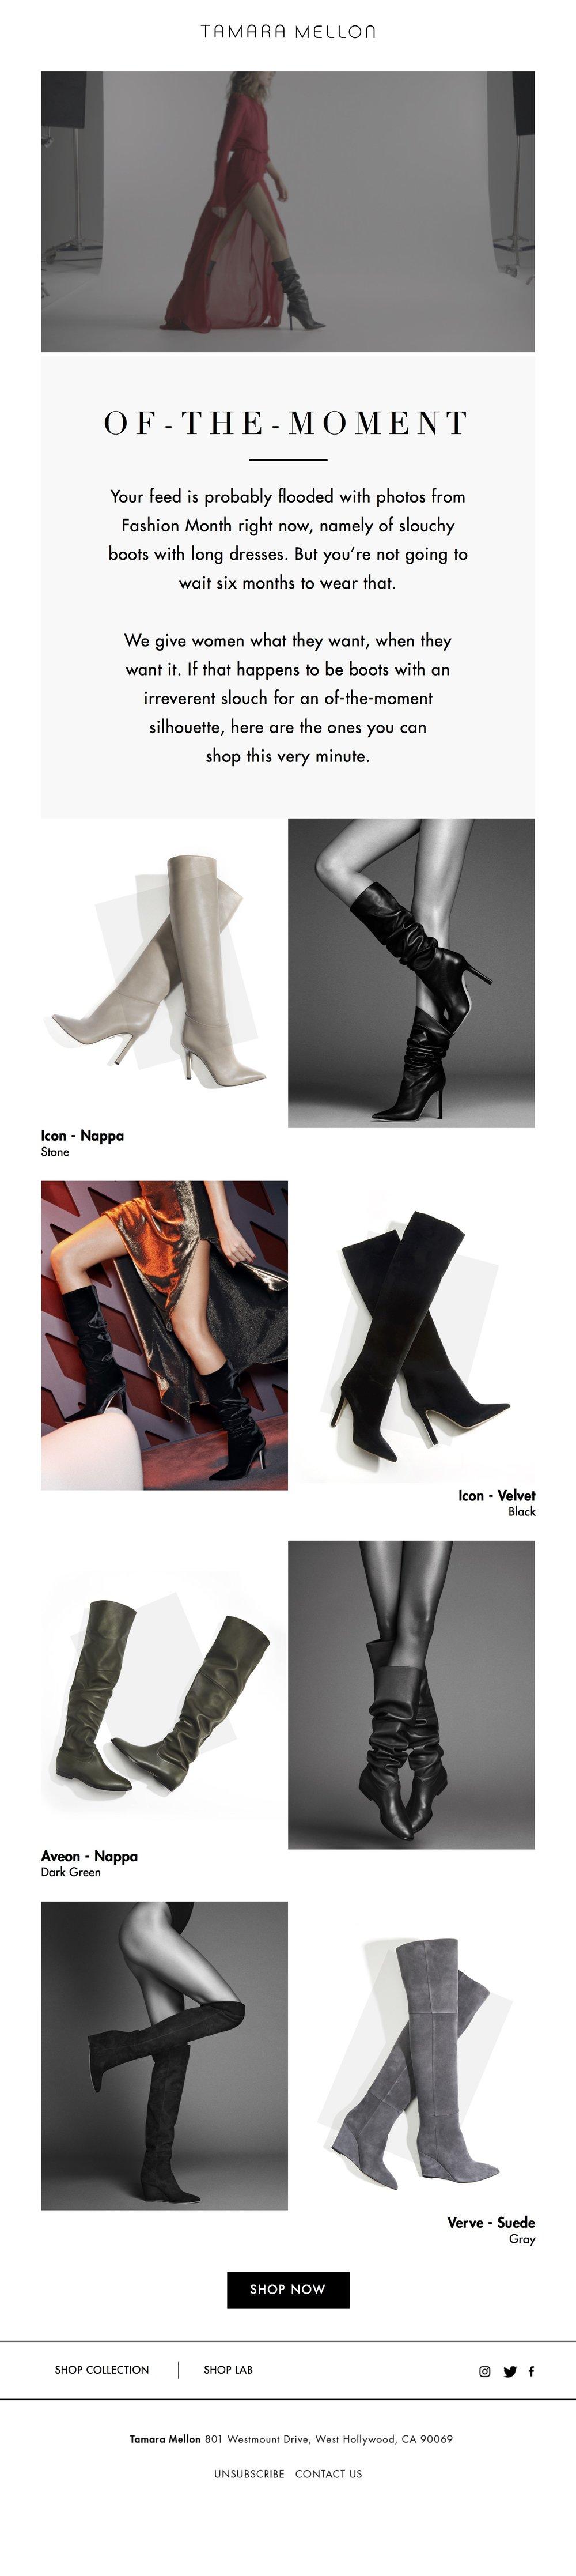 02242018_FashionWeek_Story_x.jpg